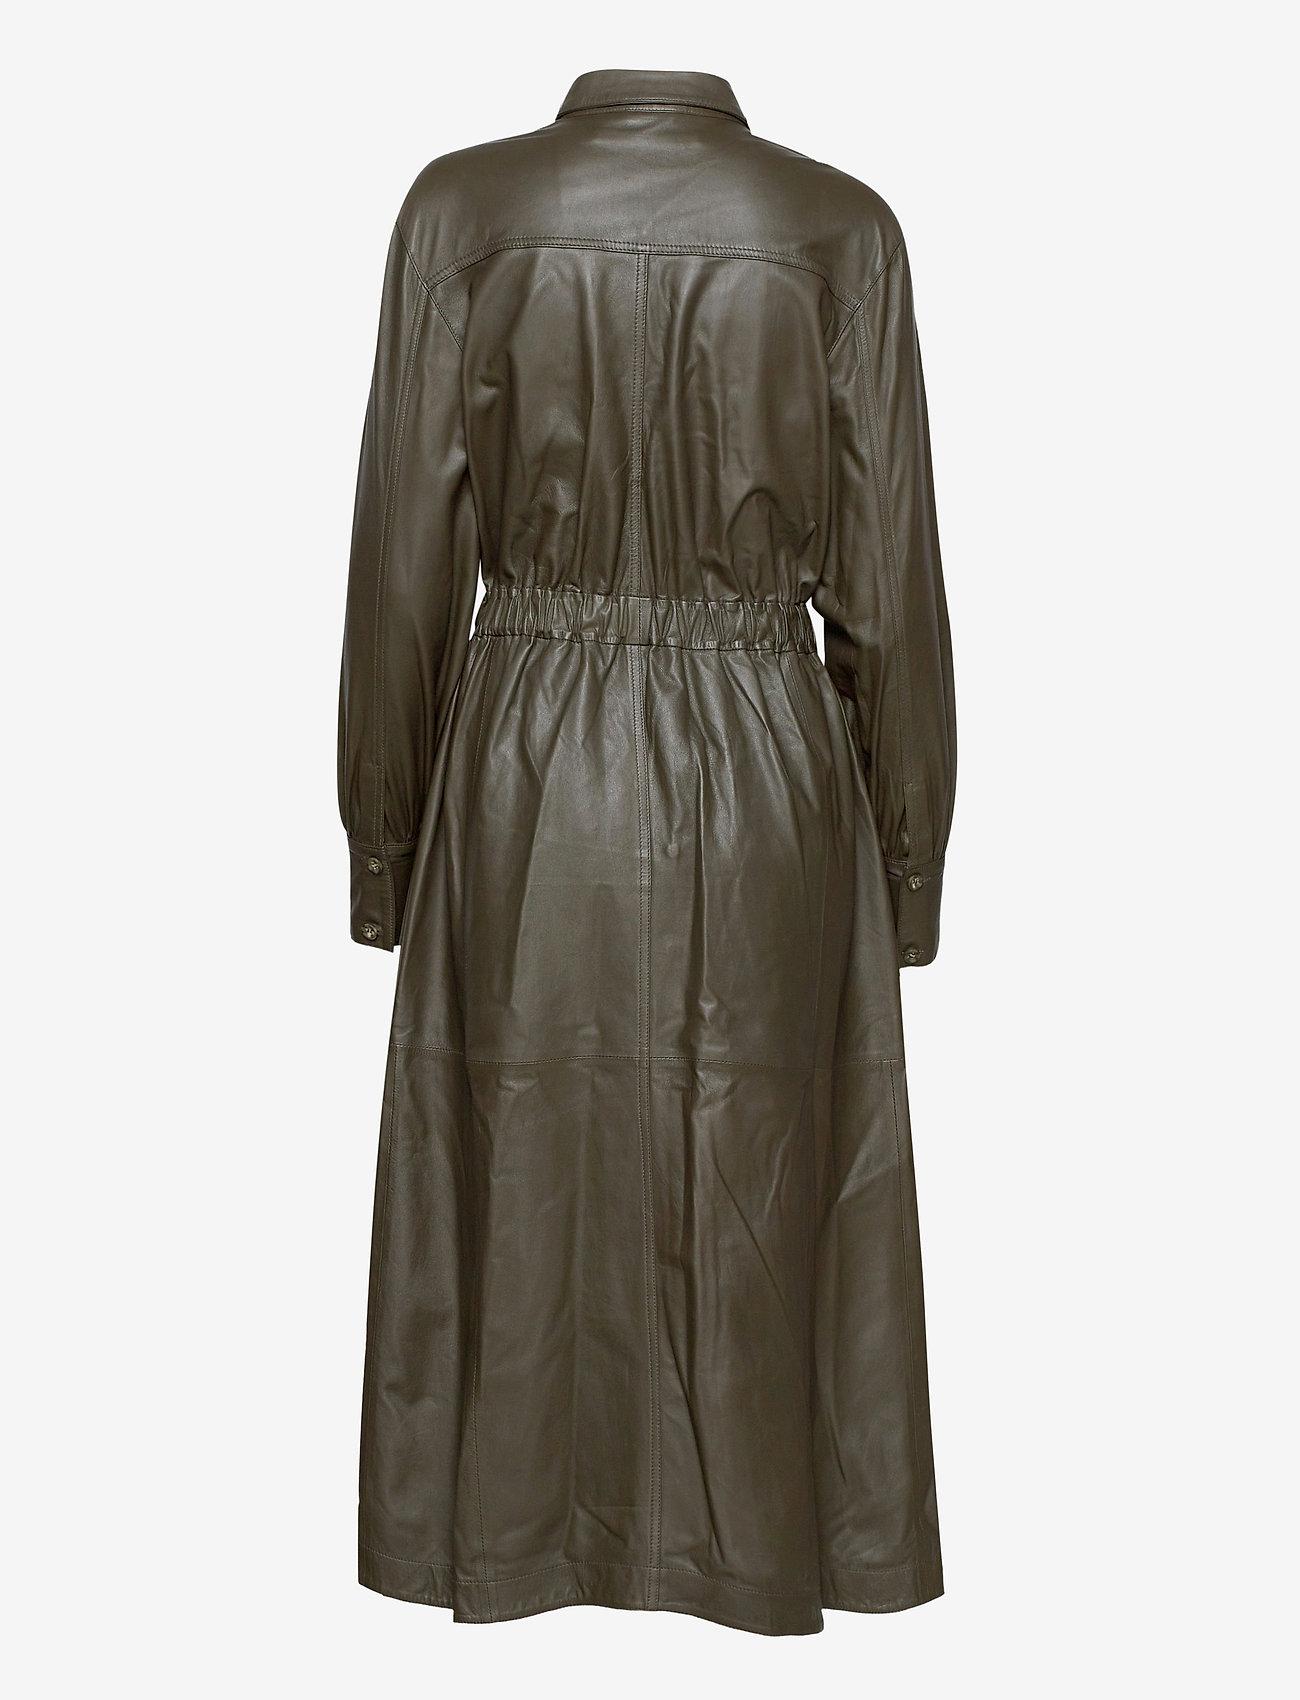 MDK / Munderingskompagniet - Lily thin leather dress - skjortklänningar - dark green - 1